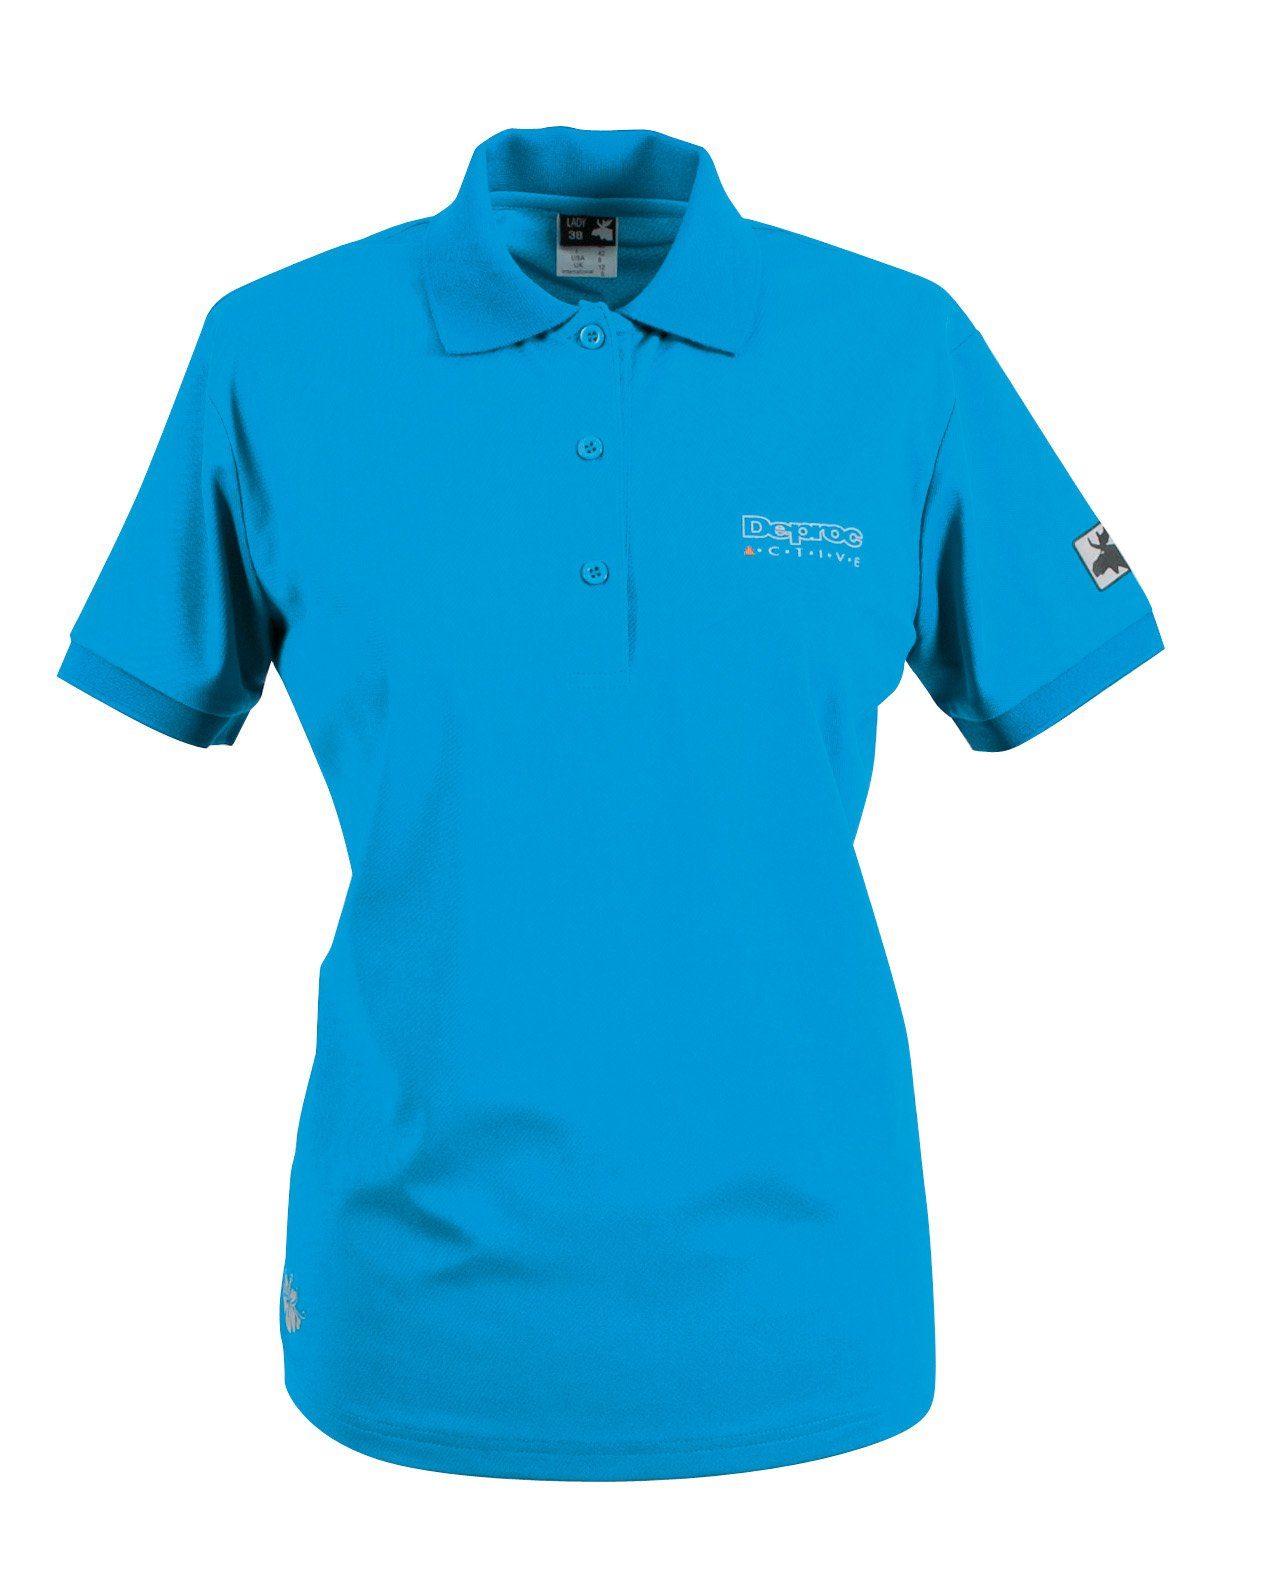 DEPROC Active Poloshirt »HEDLEY WOMEN«